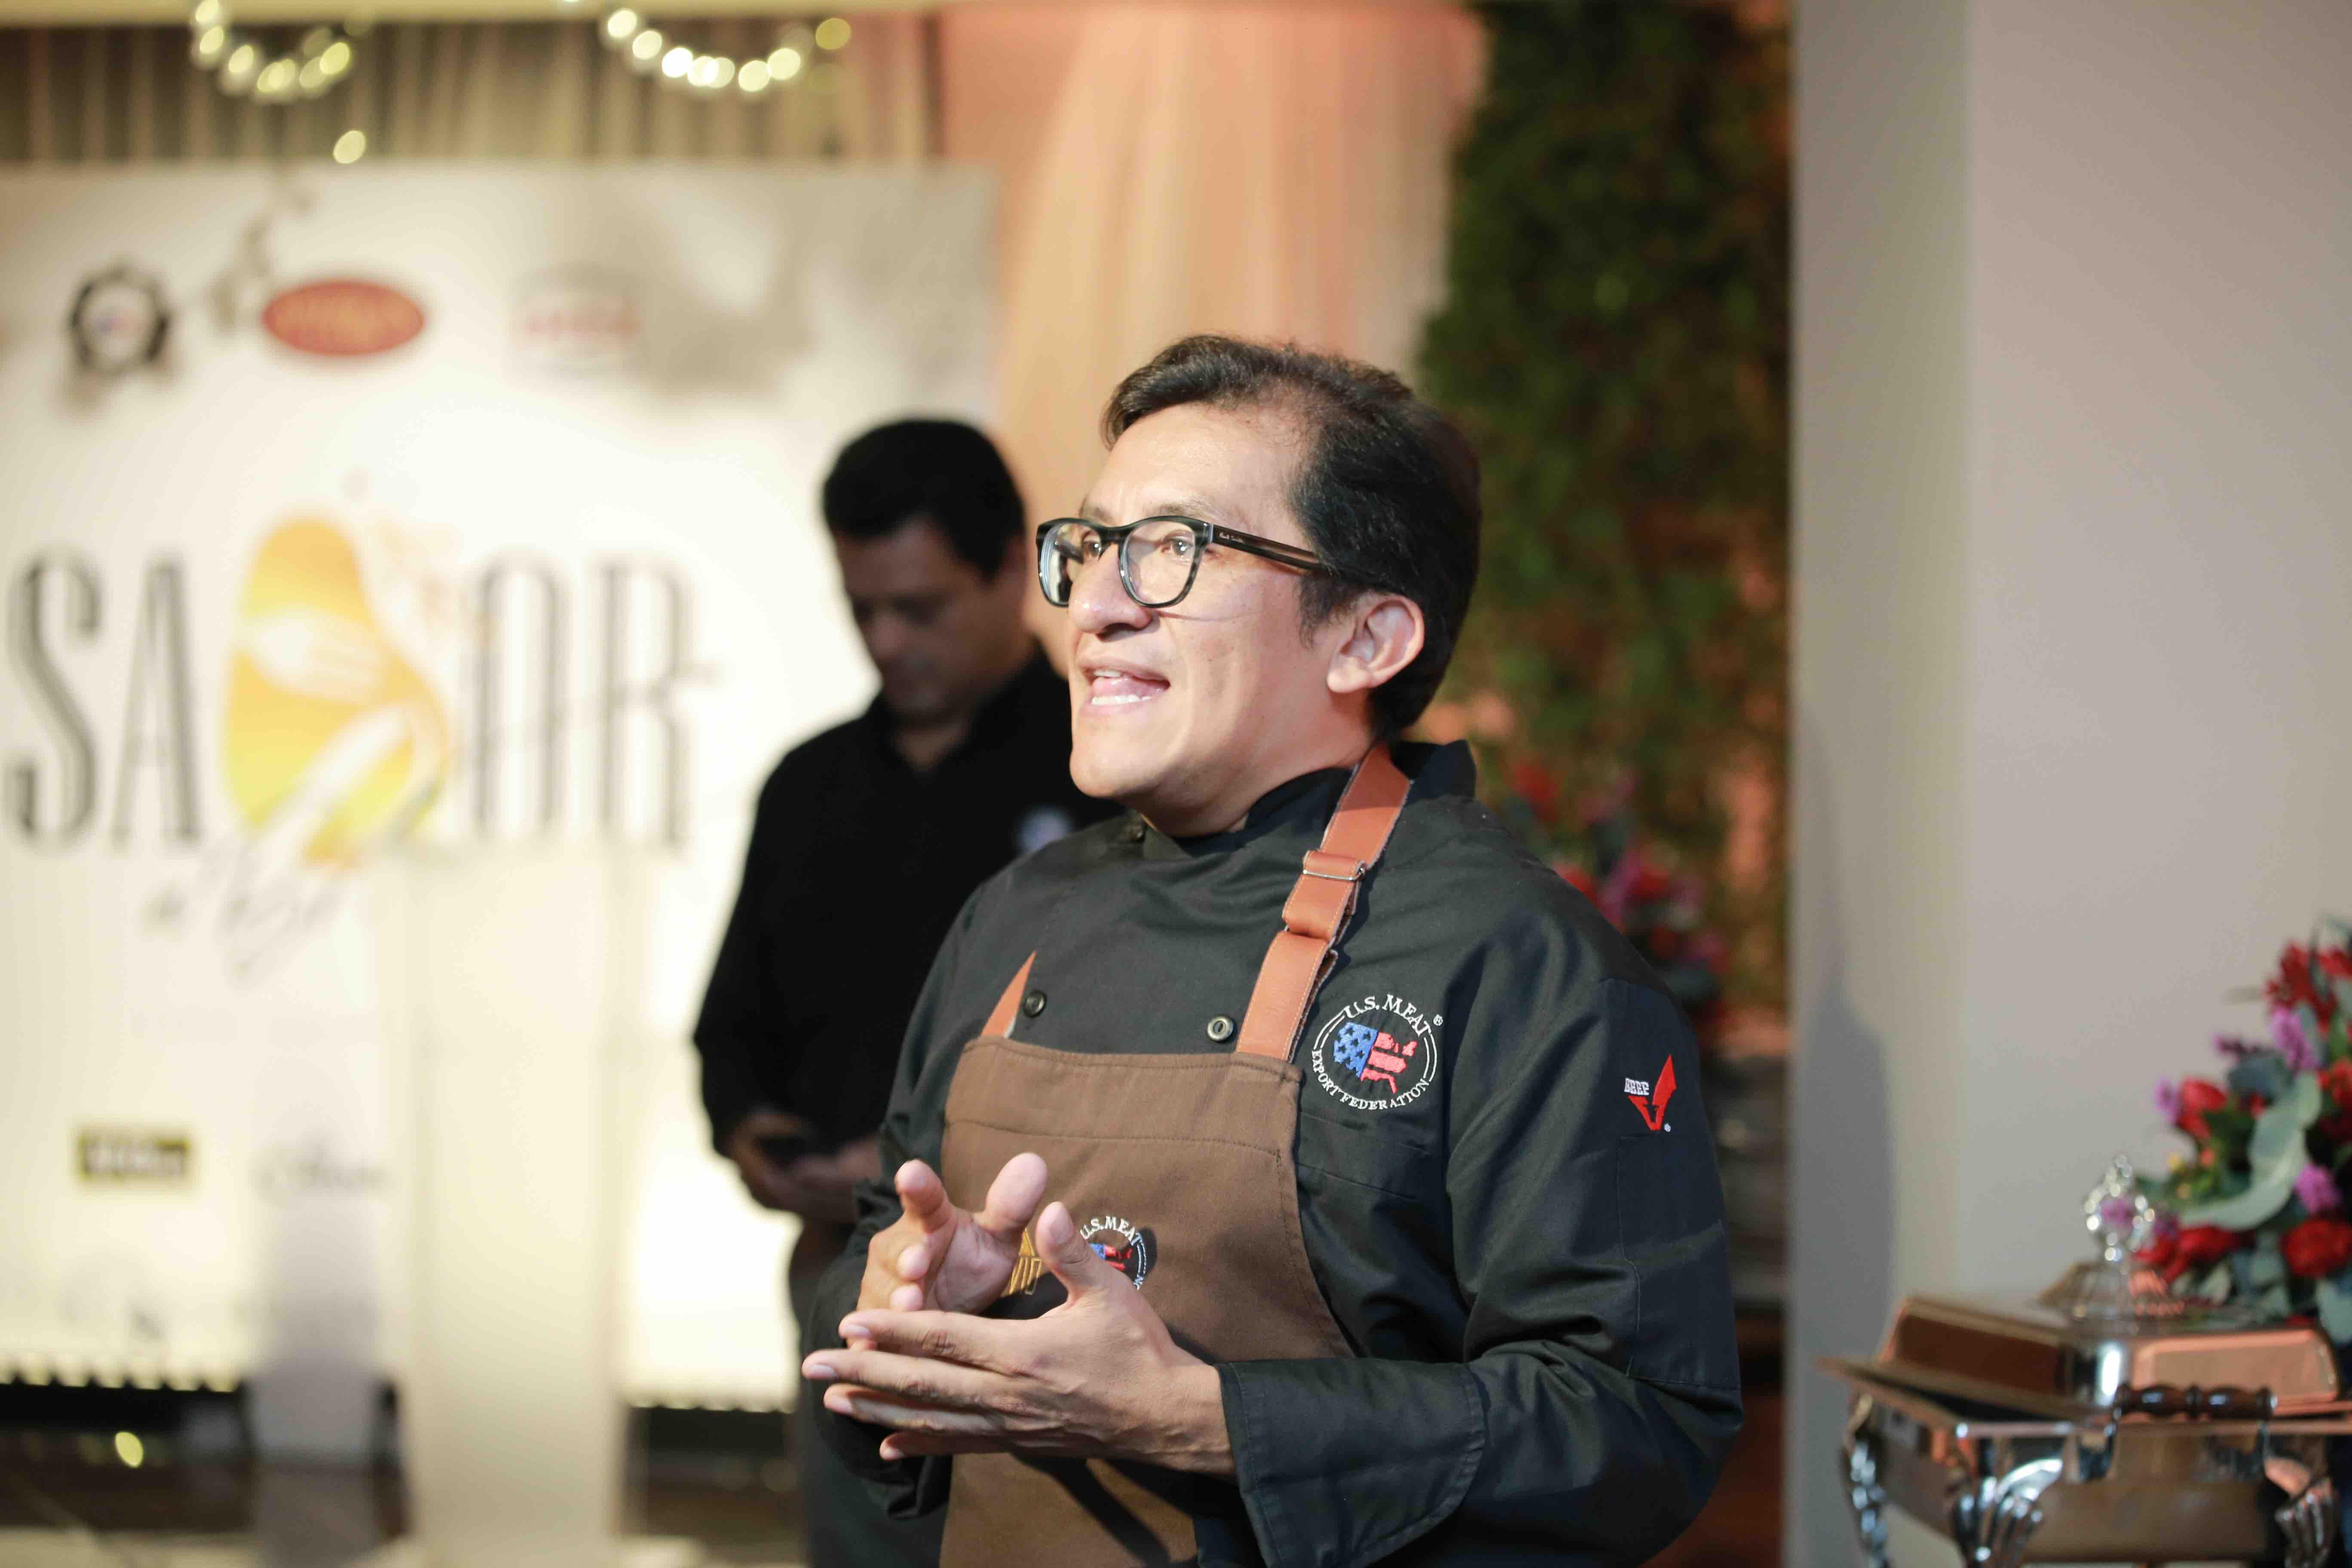 Chef German Navarrete compartiendo las bondades del Cordero Americano